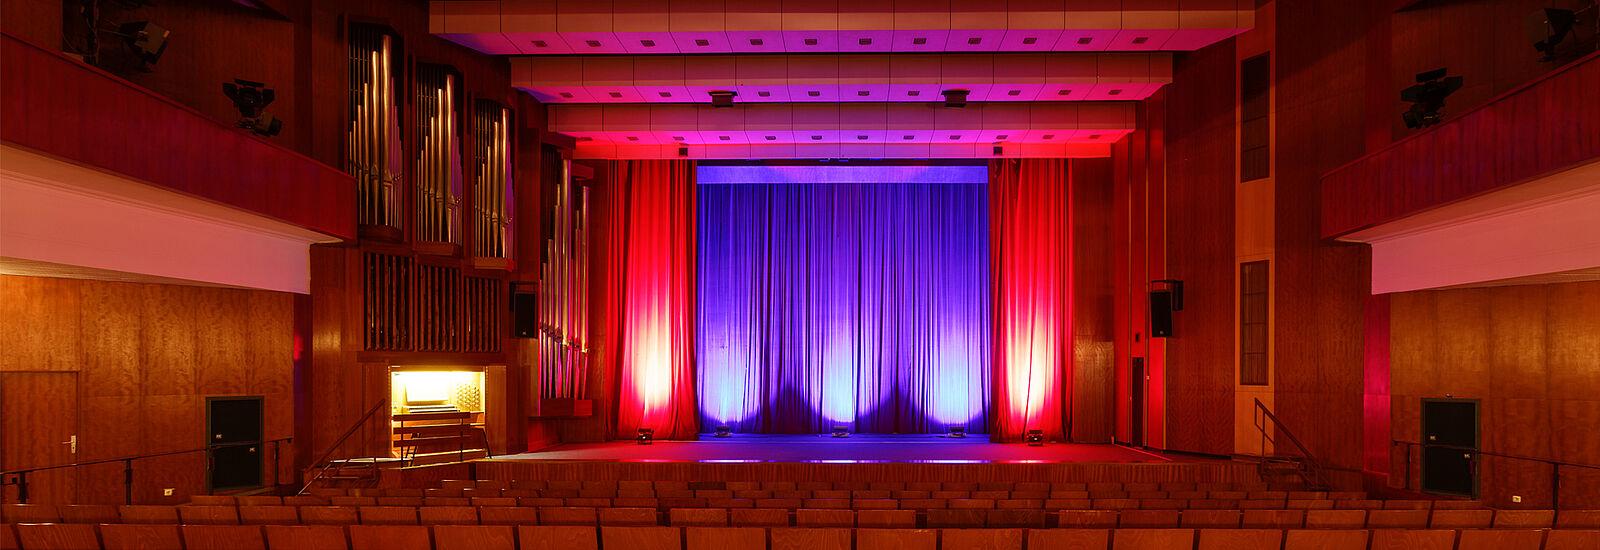 Kulturhaus Gotha ©Bernd Seydel